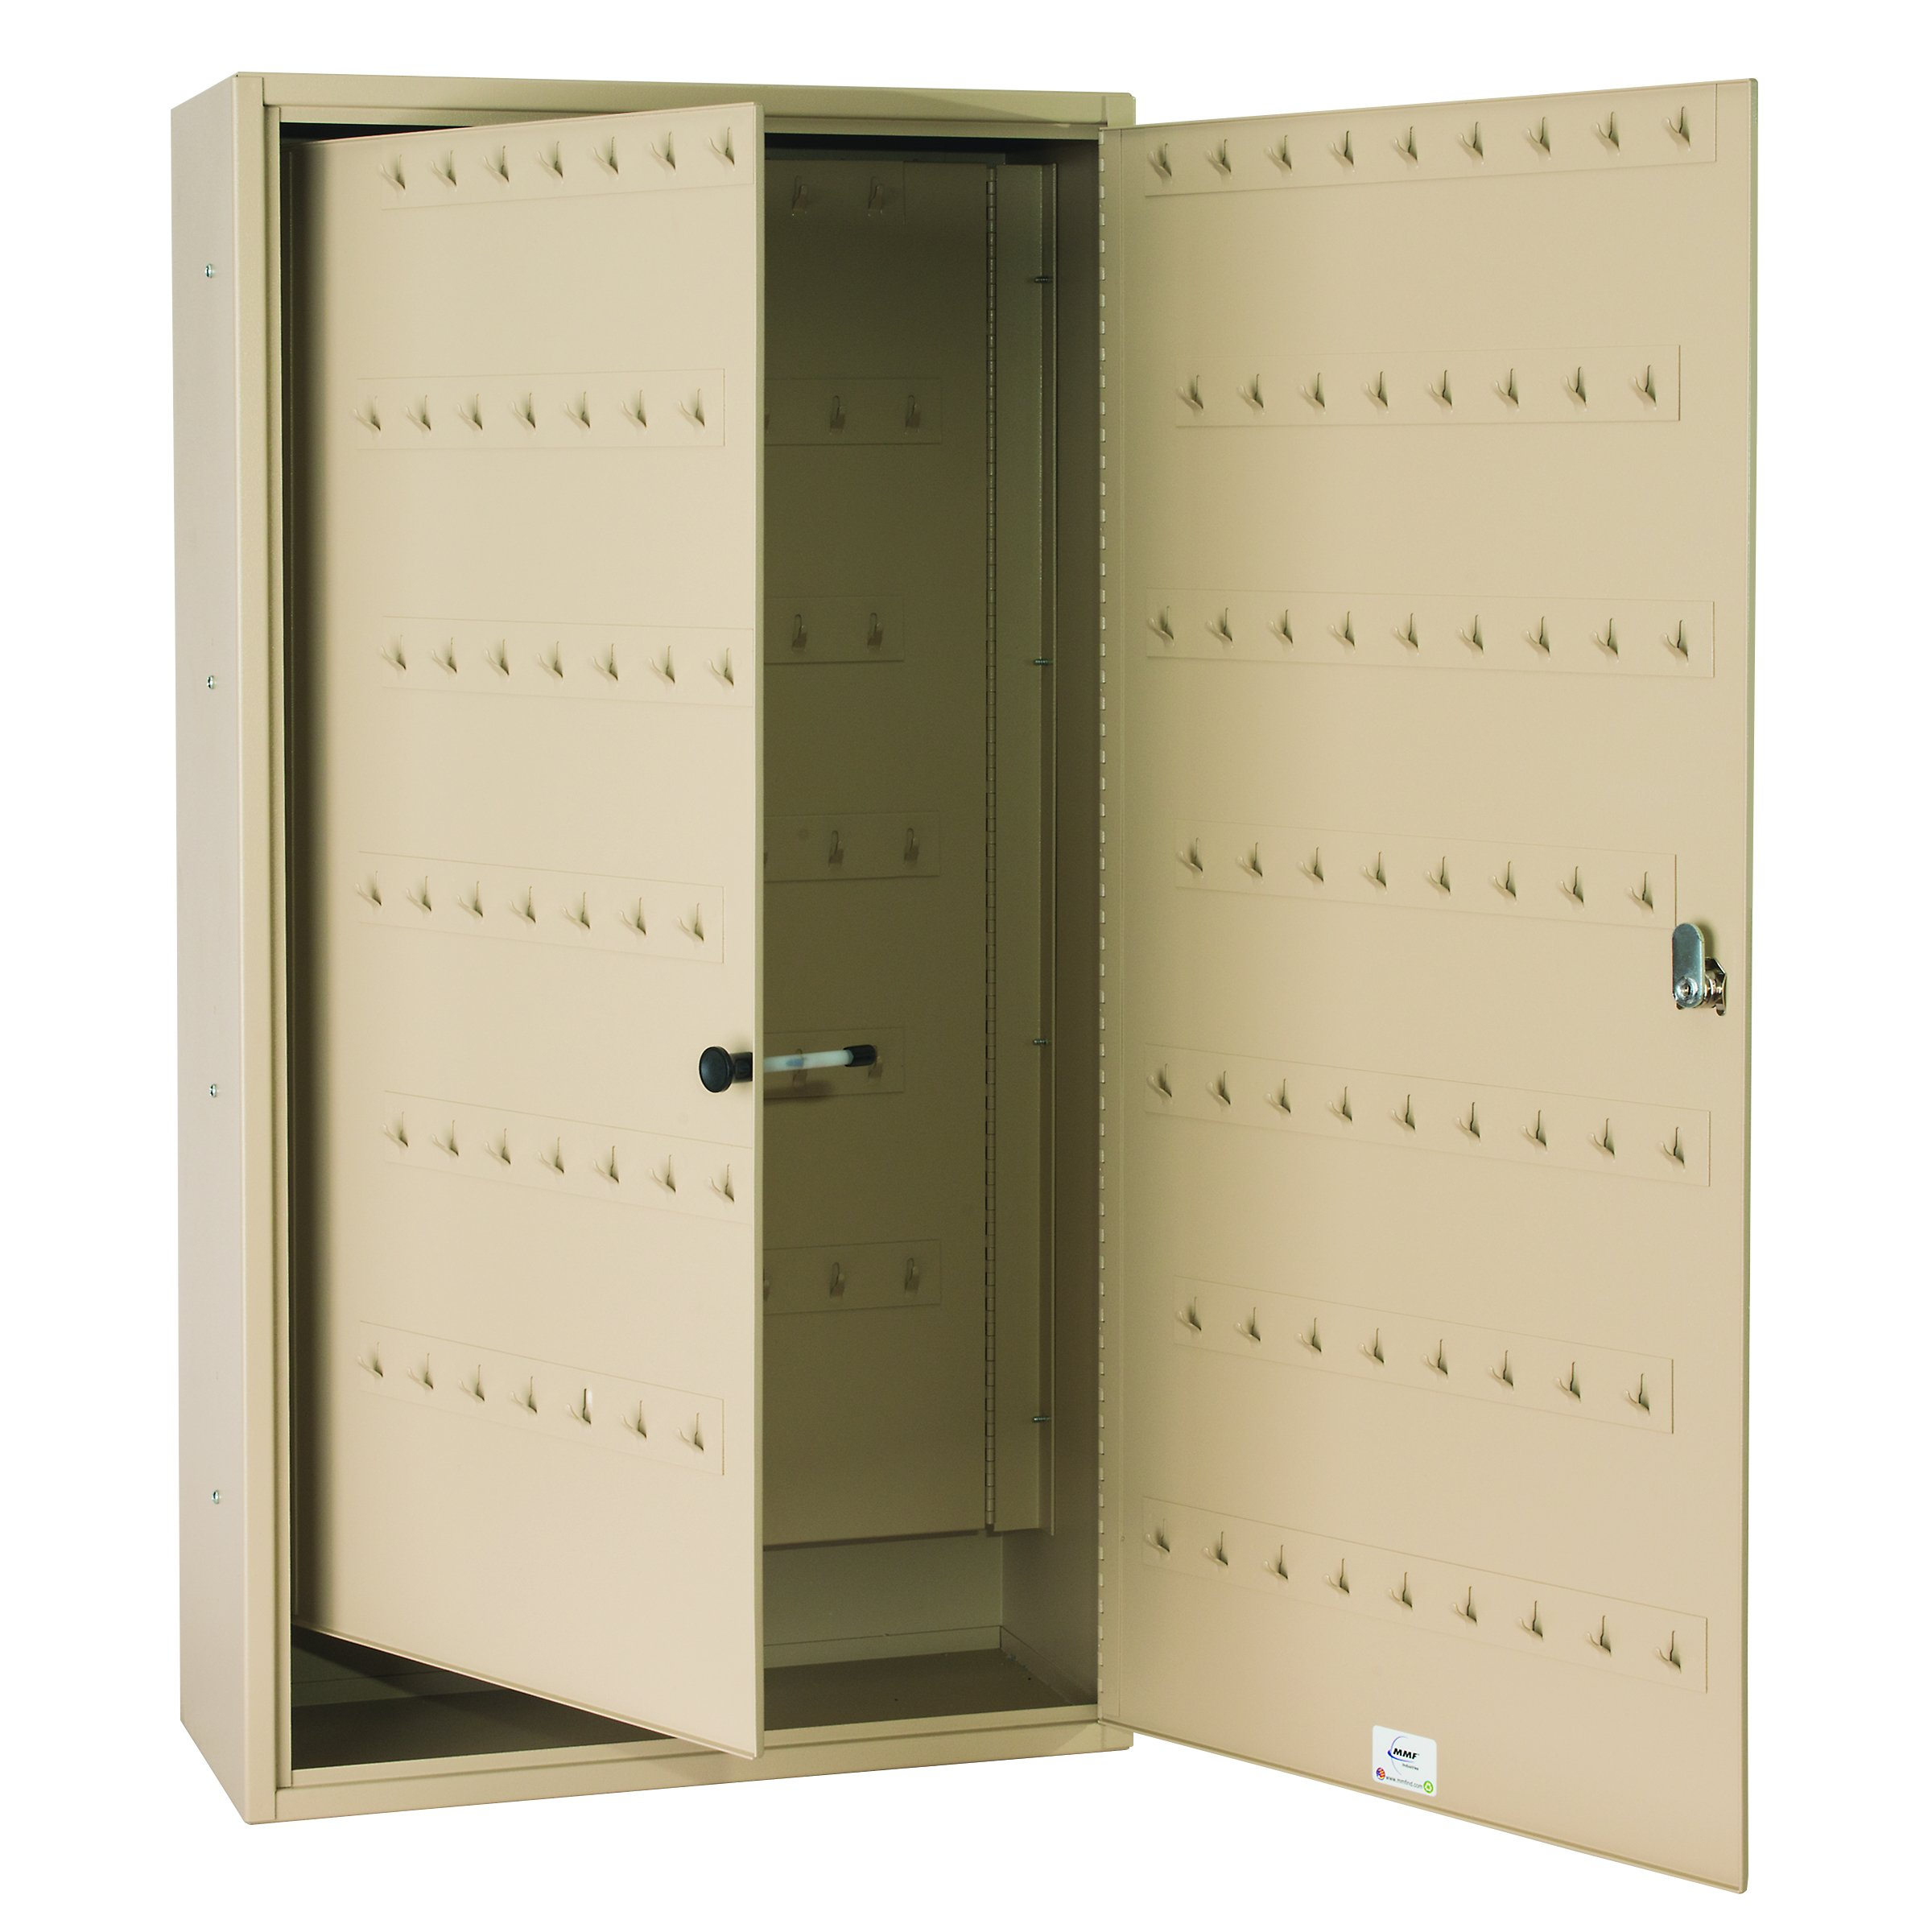 Steelmaster Fob-Friendly Key Cabinet, 31.125 x 16.5 x 8 Inches, 130-Key Capacity, Sand (201013003)